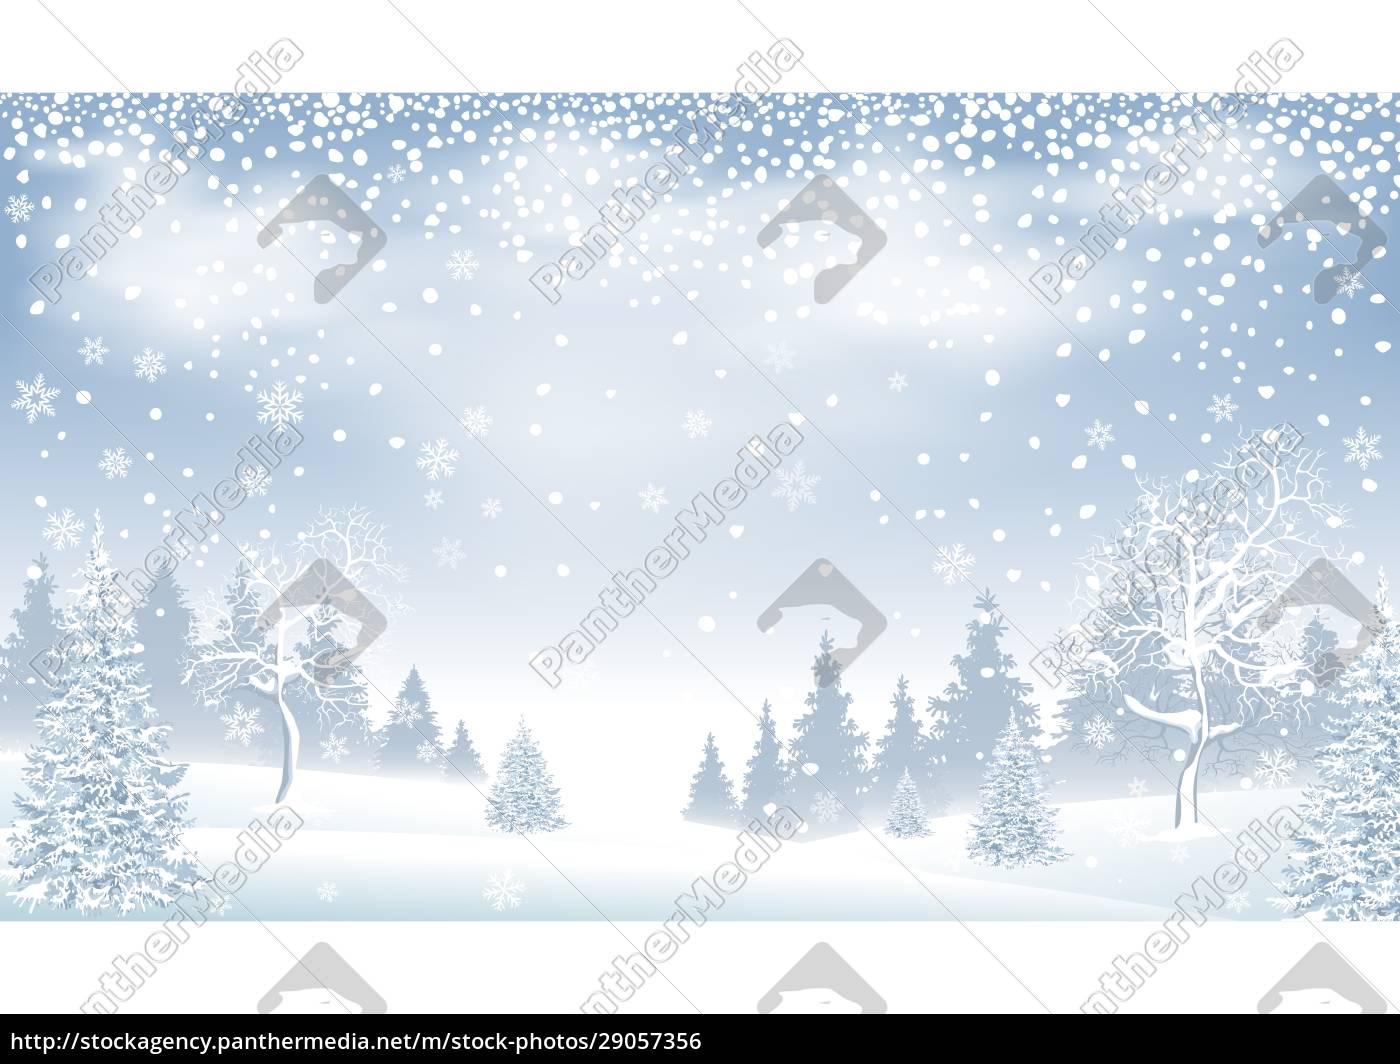 winter, landscape, forest, snow, snowflakes - 29057356